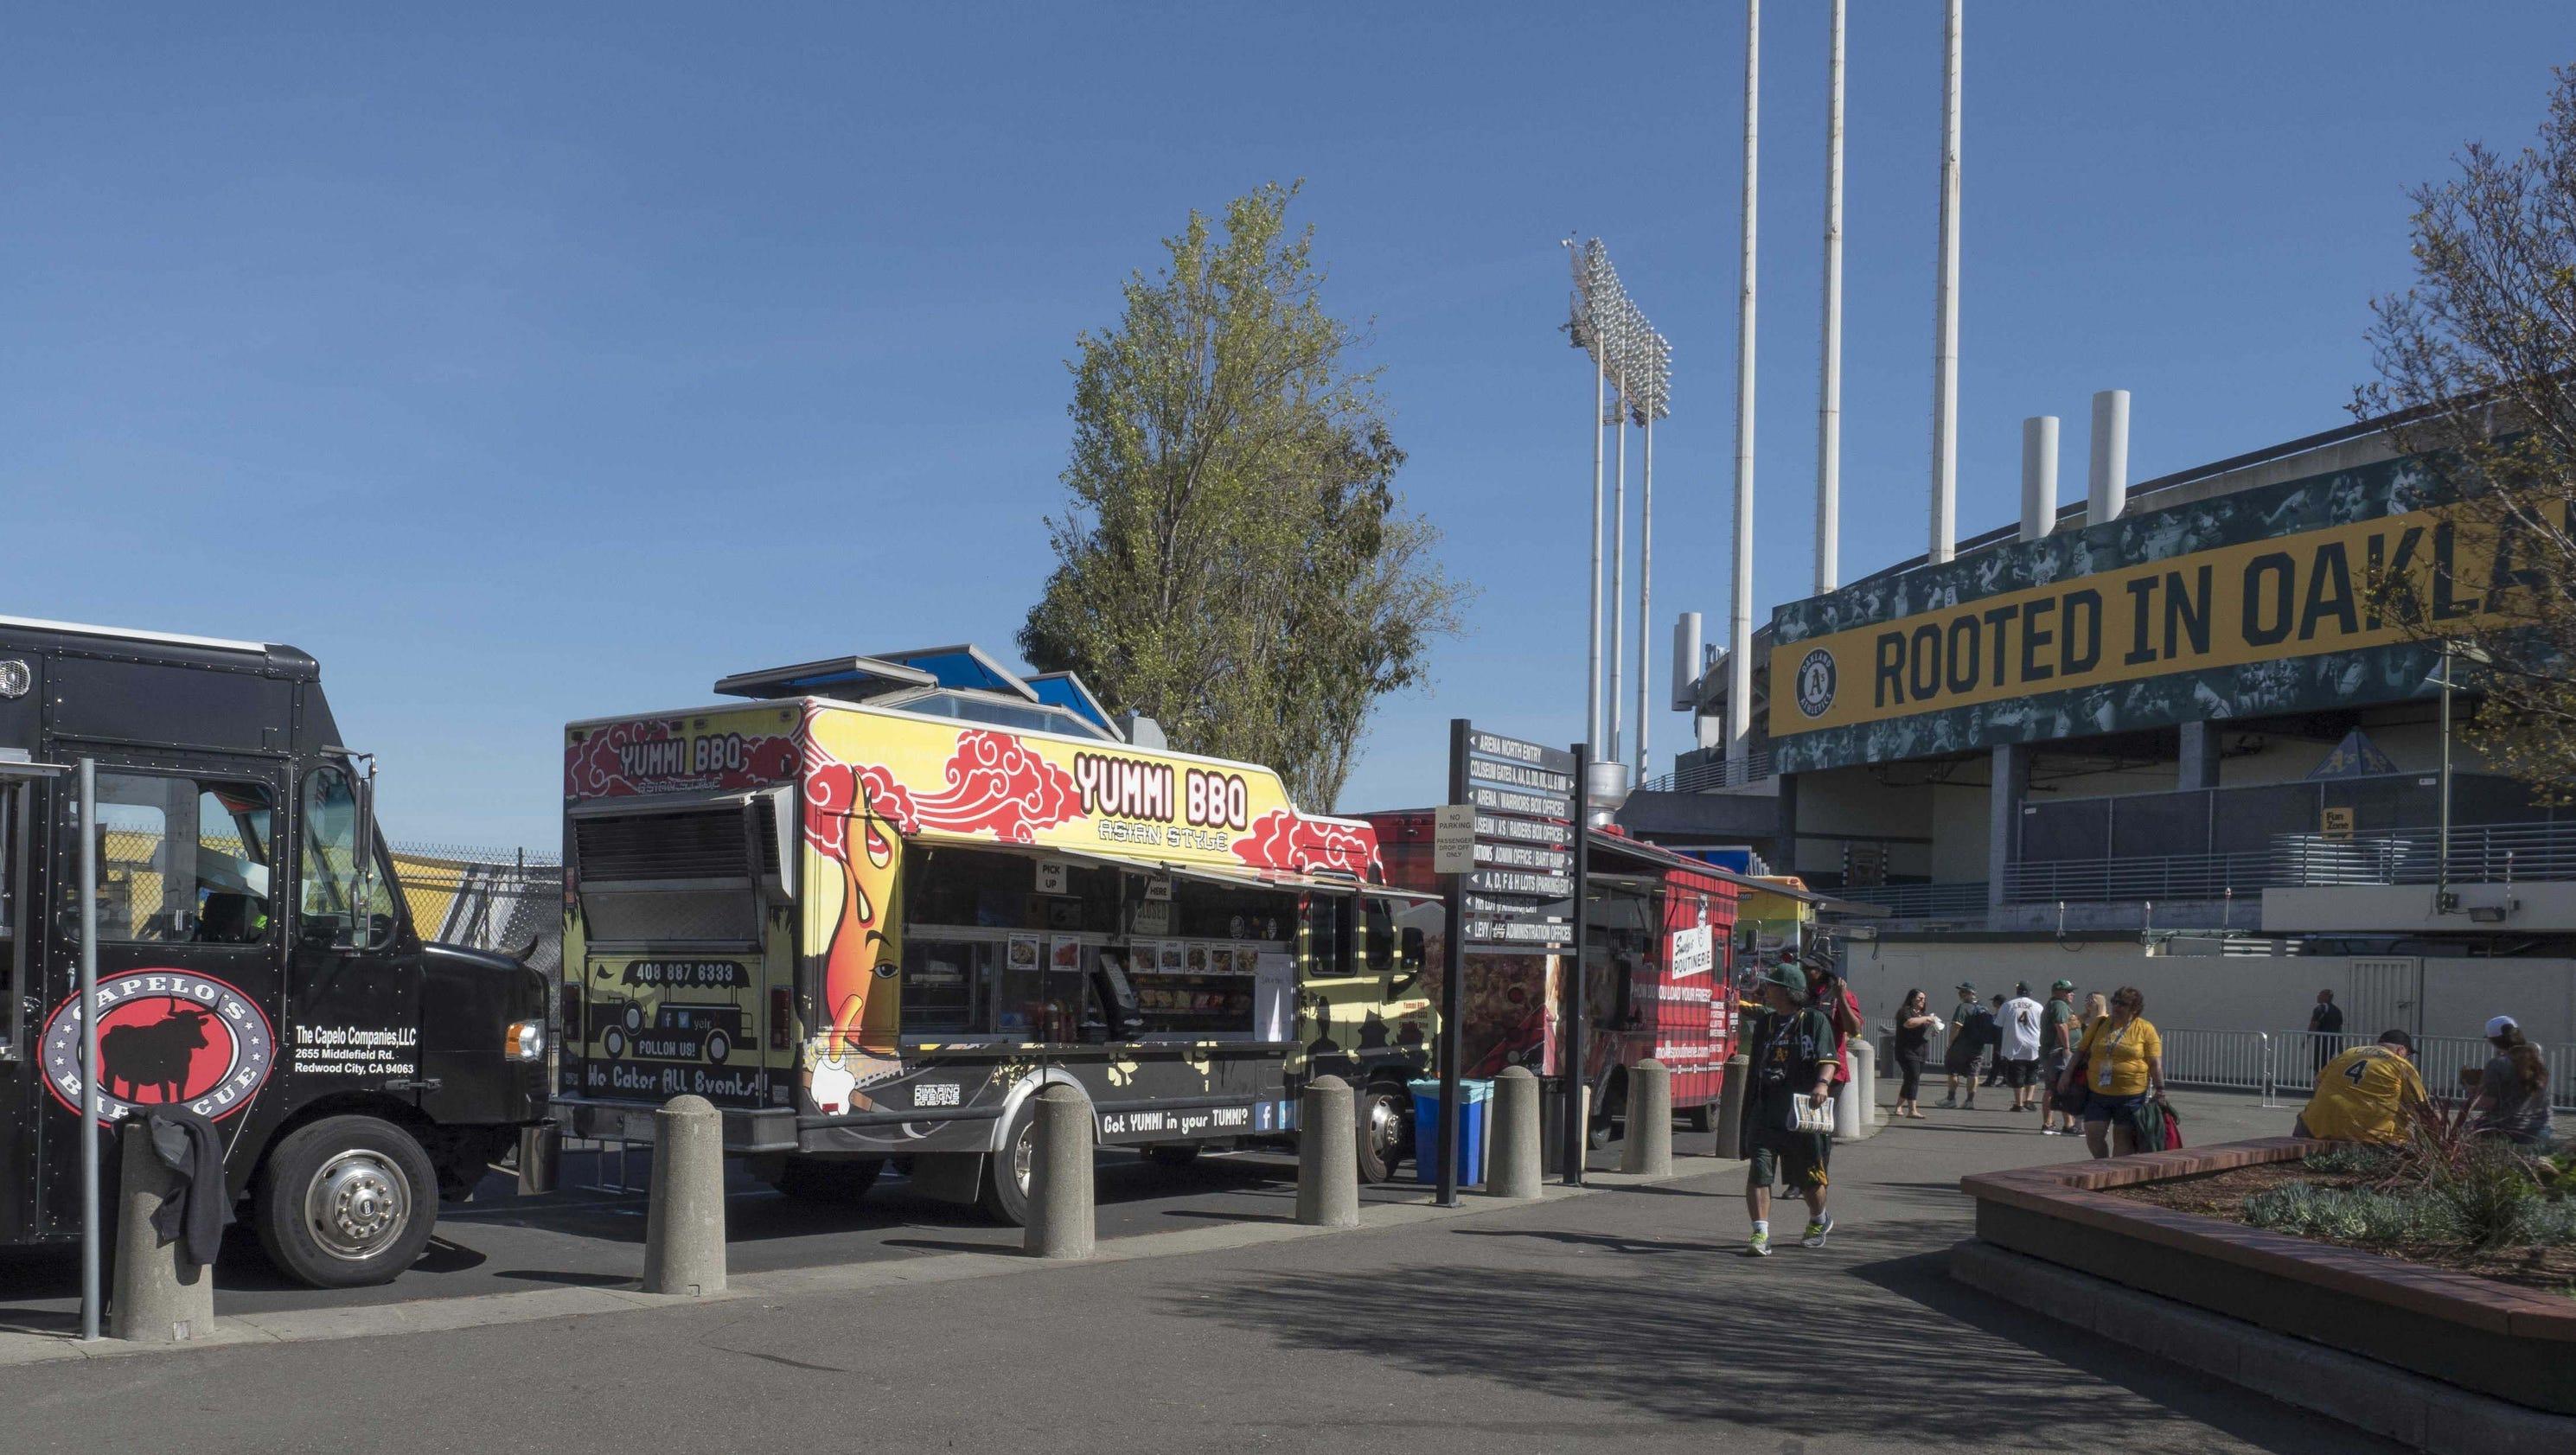 Food Trucks In Oakland Today